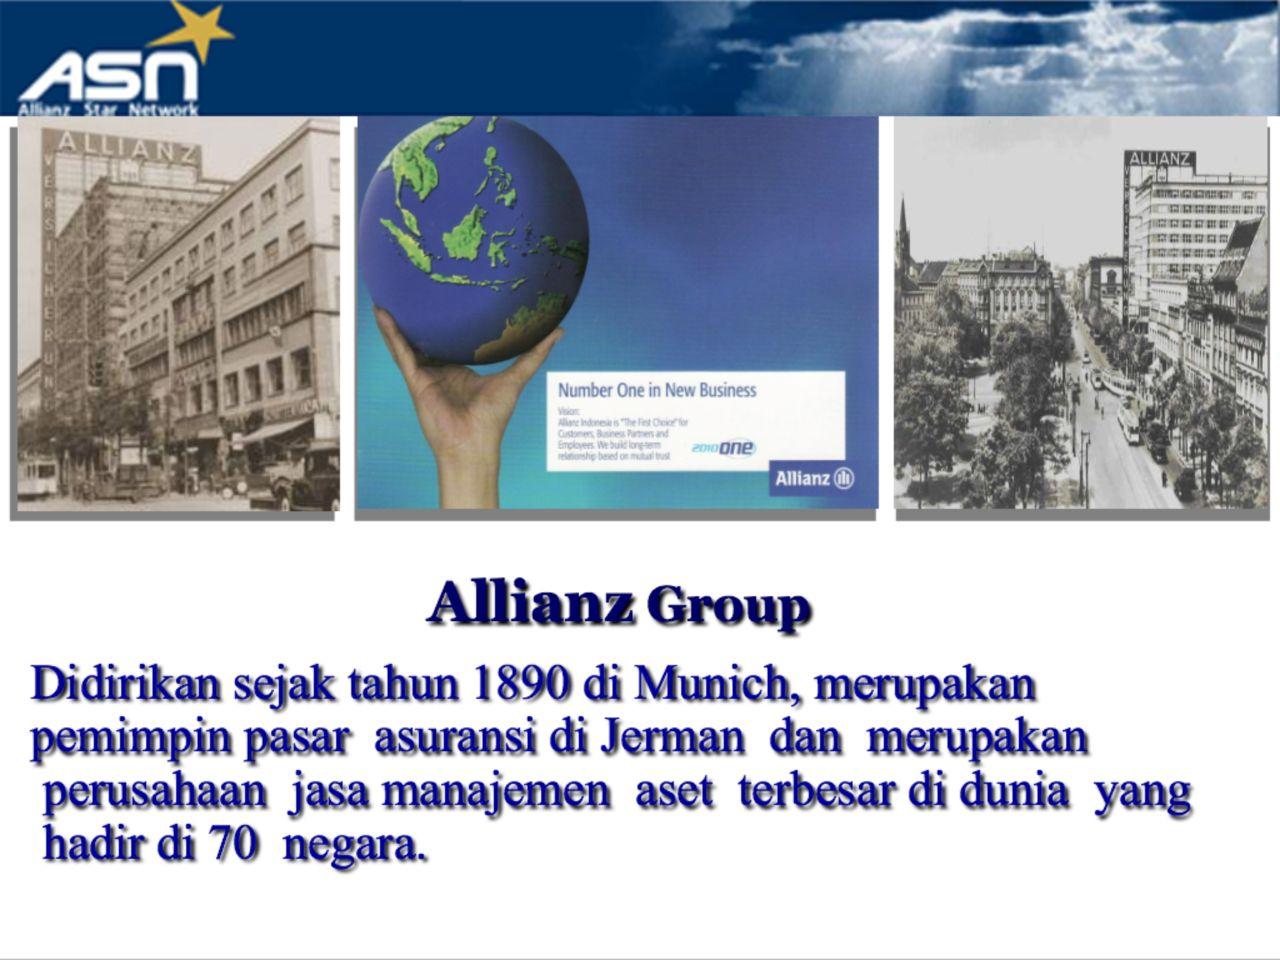 Mengenal Lebih Dalam Asuransi Allianz Berdiri Sejak Tahun 1890